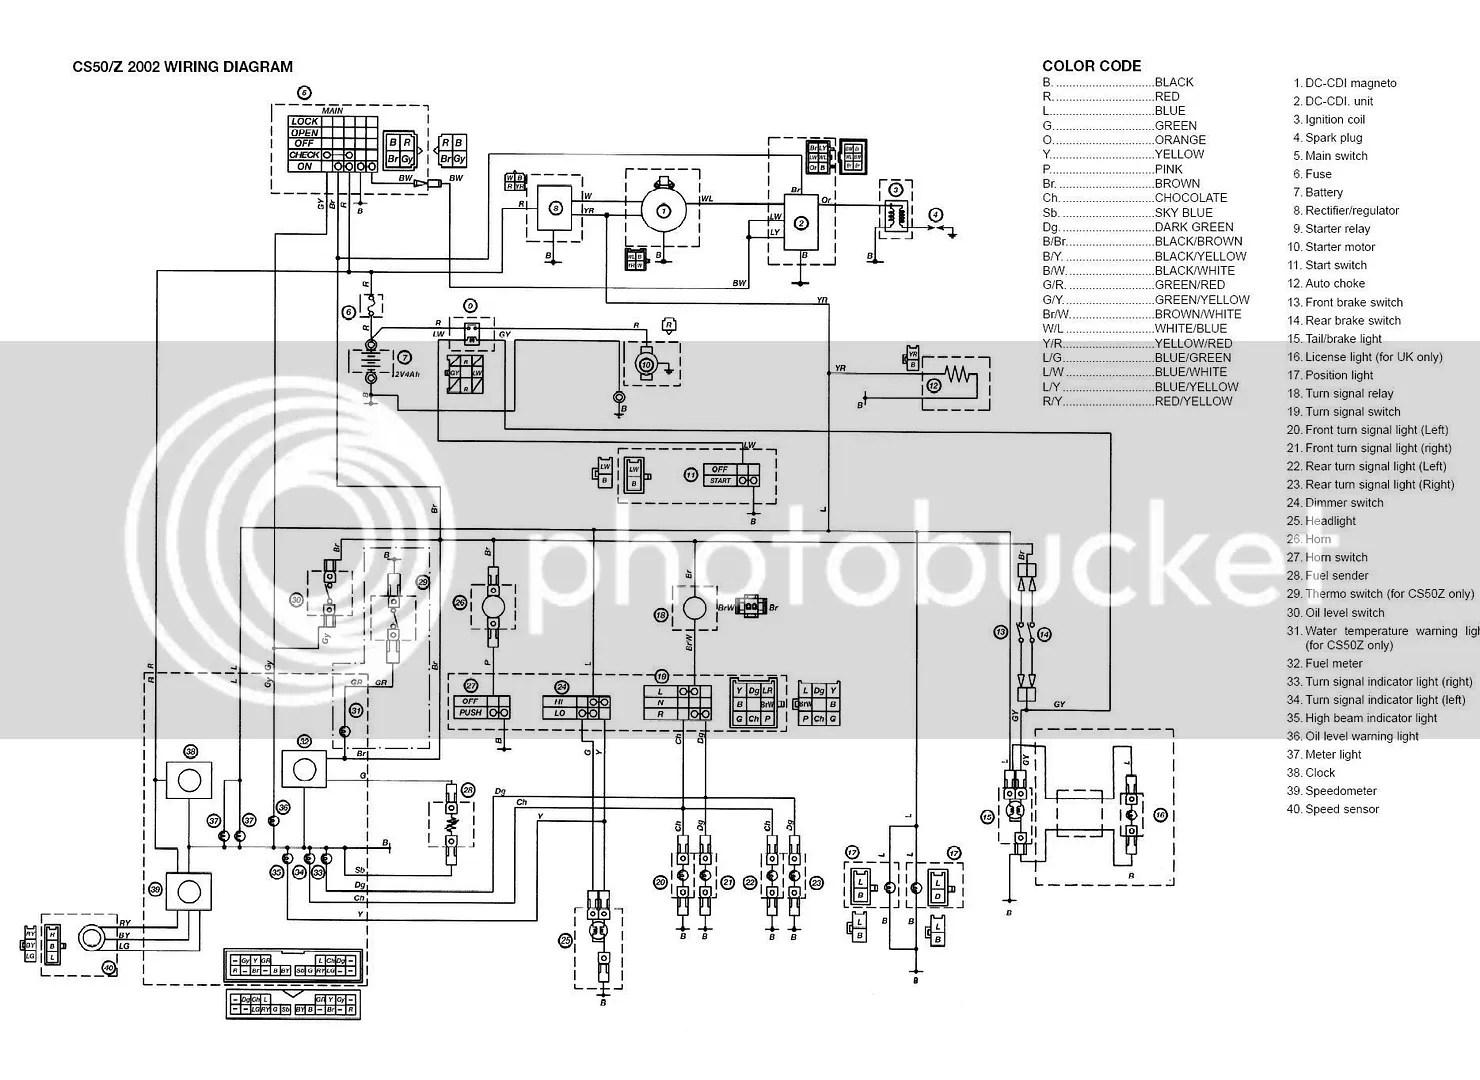 yamaha aerox wiring diagram 2003 dodge durango car stereo yamahajog02 jpg photo by hmmmnz2 photobucket